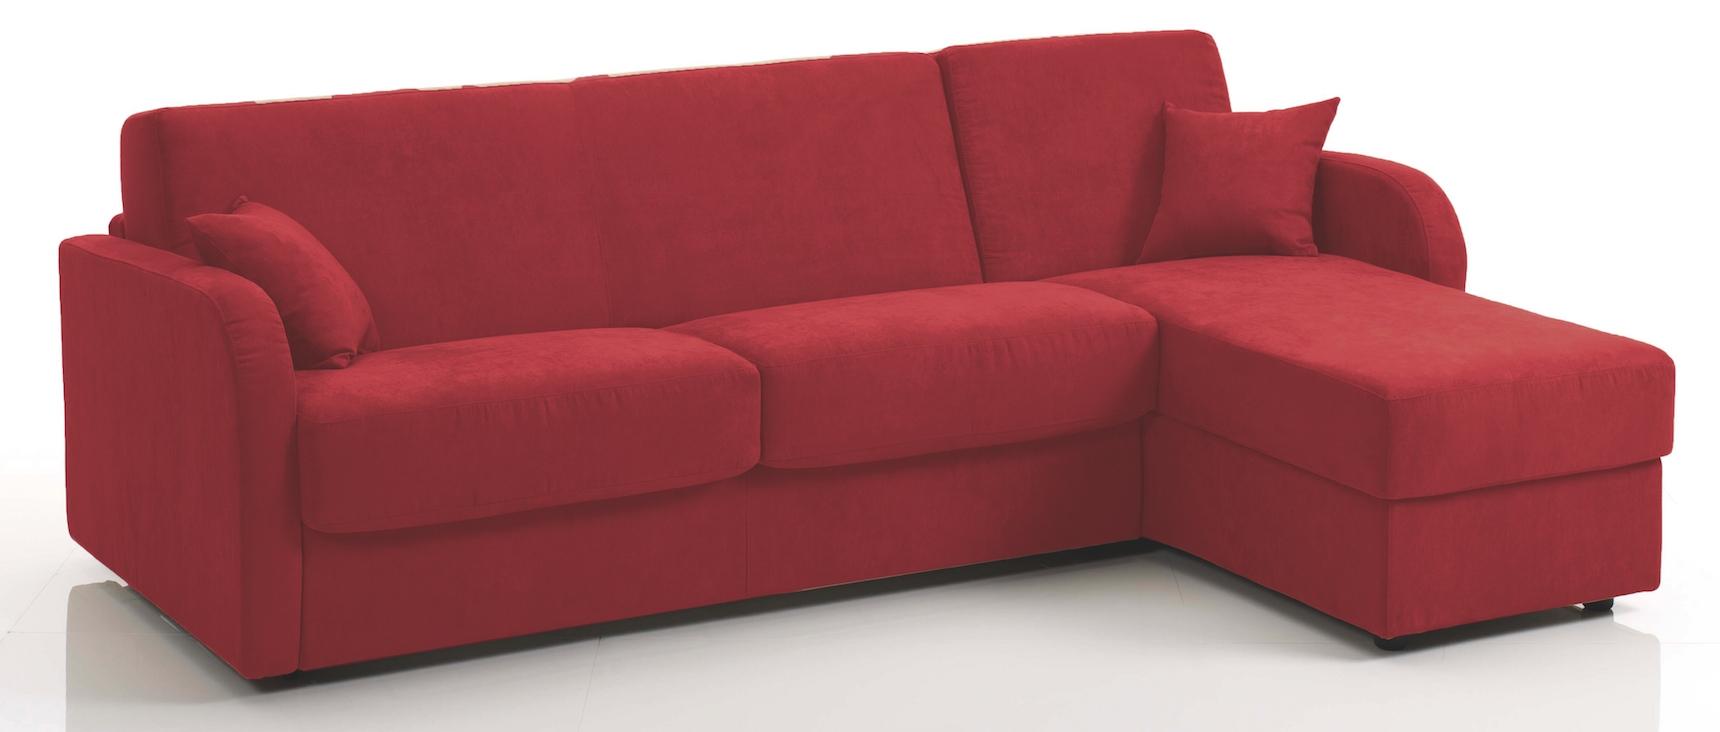 canap d 39 angle convertible rev tement microfibre bordeaux kare. Black Bedroom Furniture Sets. Home Design Ideas